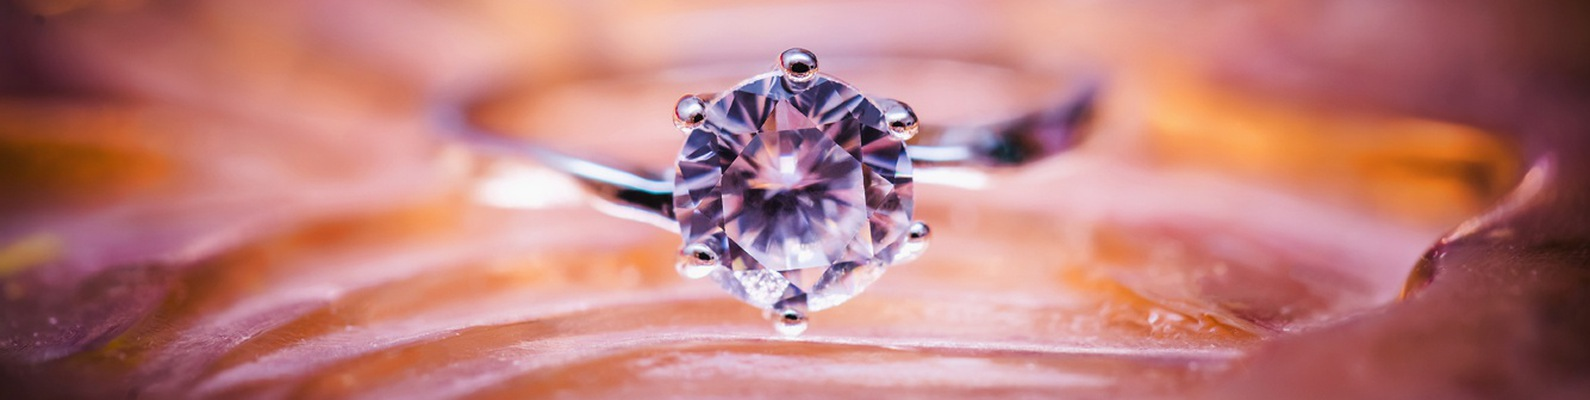 Ювелірна майстерня Lucky Diamond  1efb7420f18f5